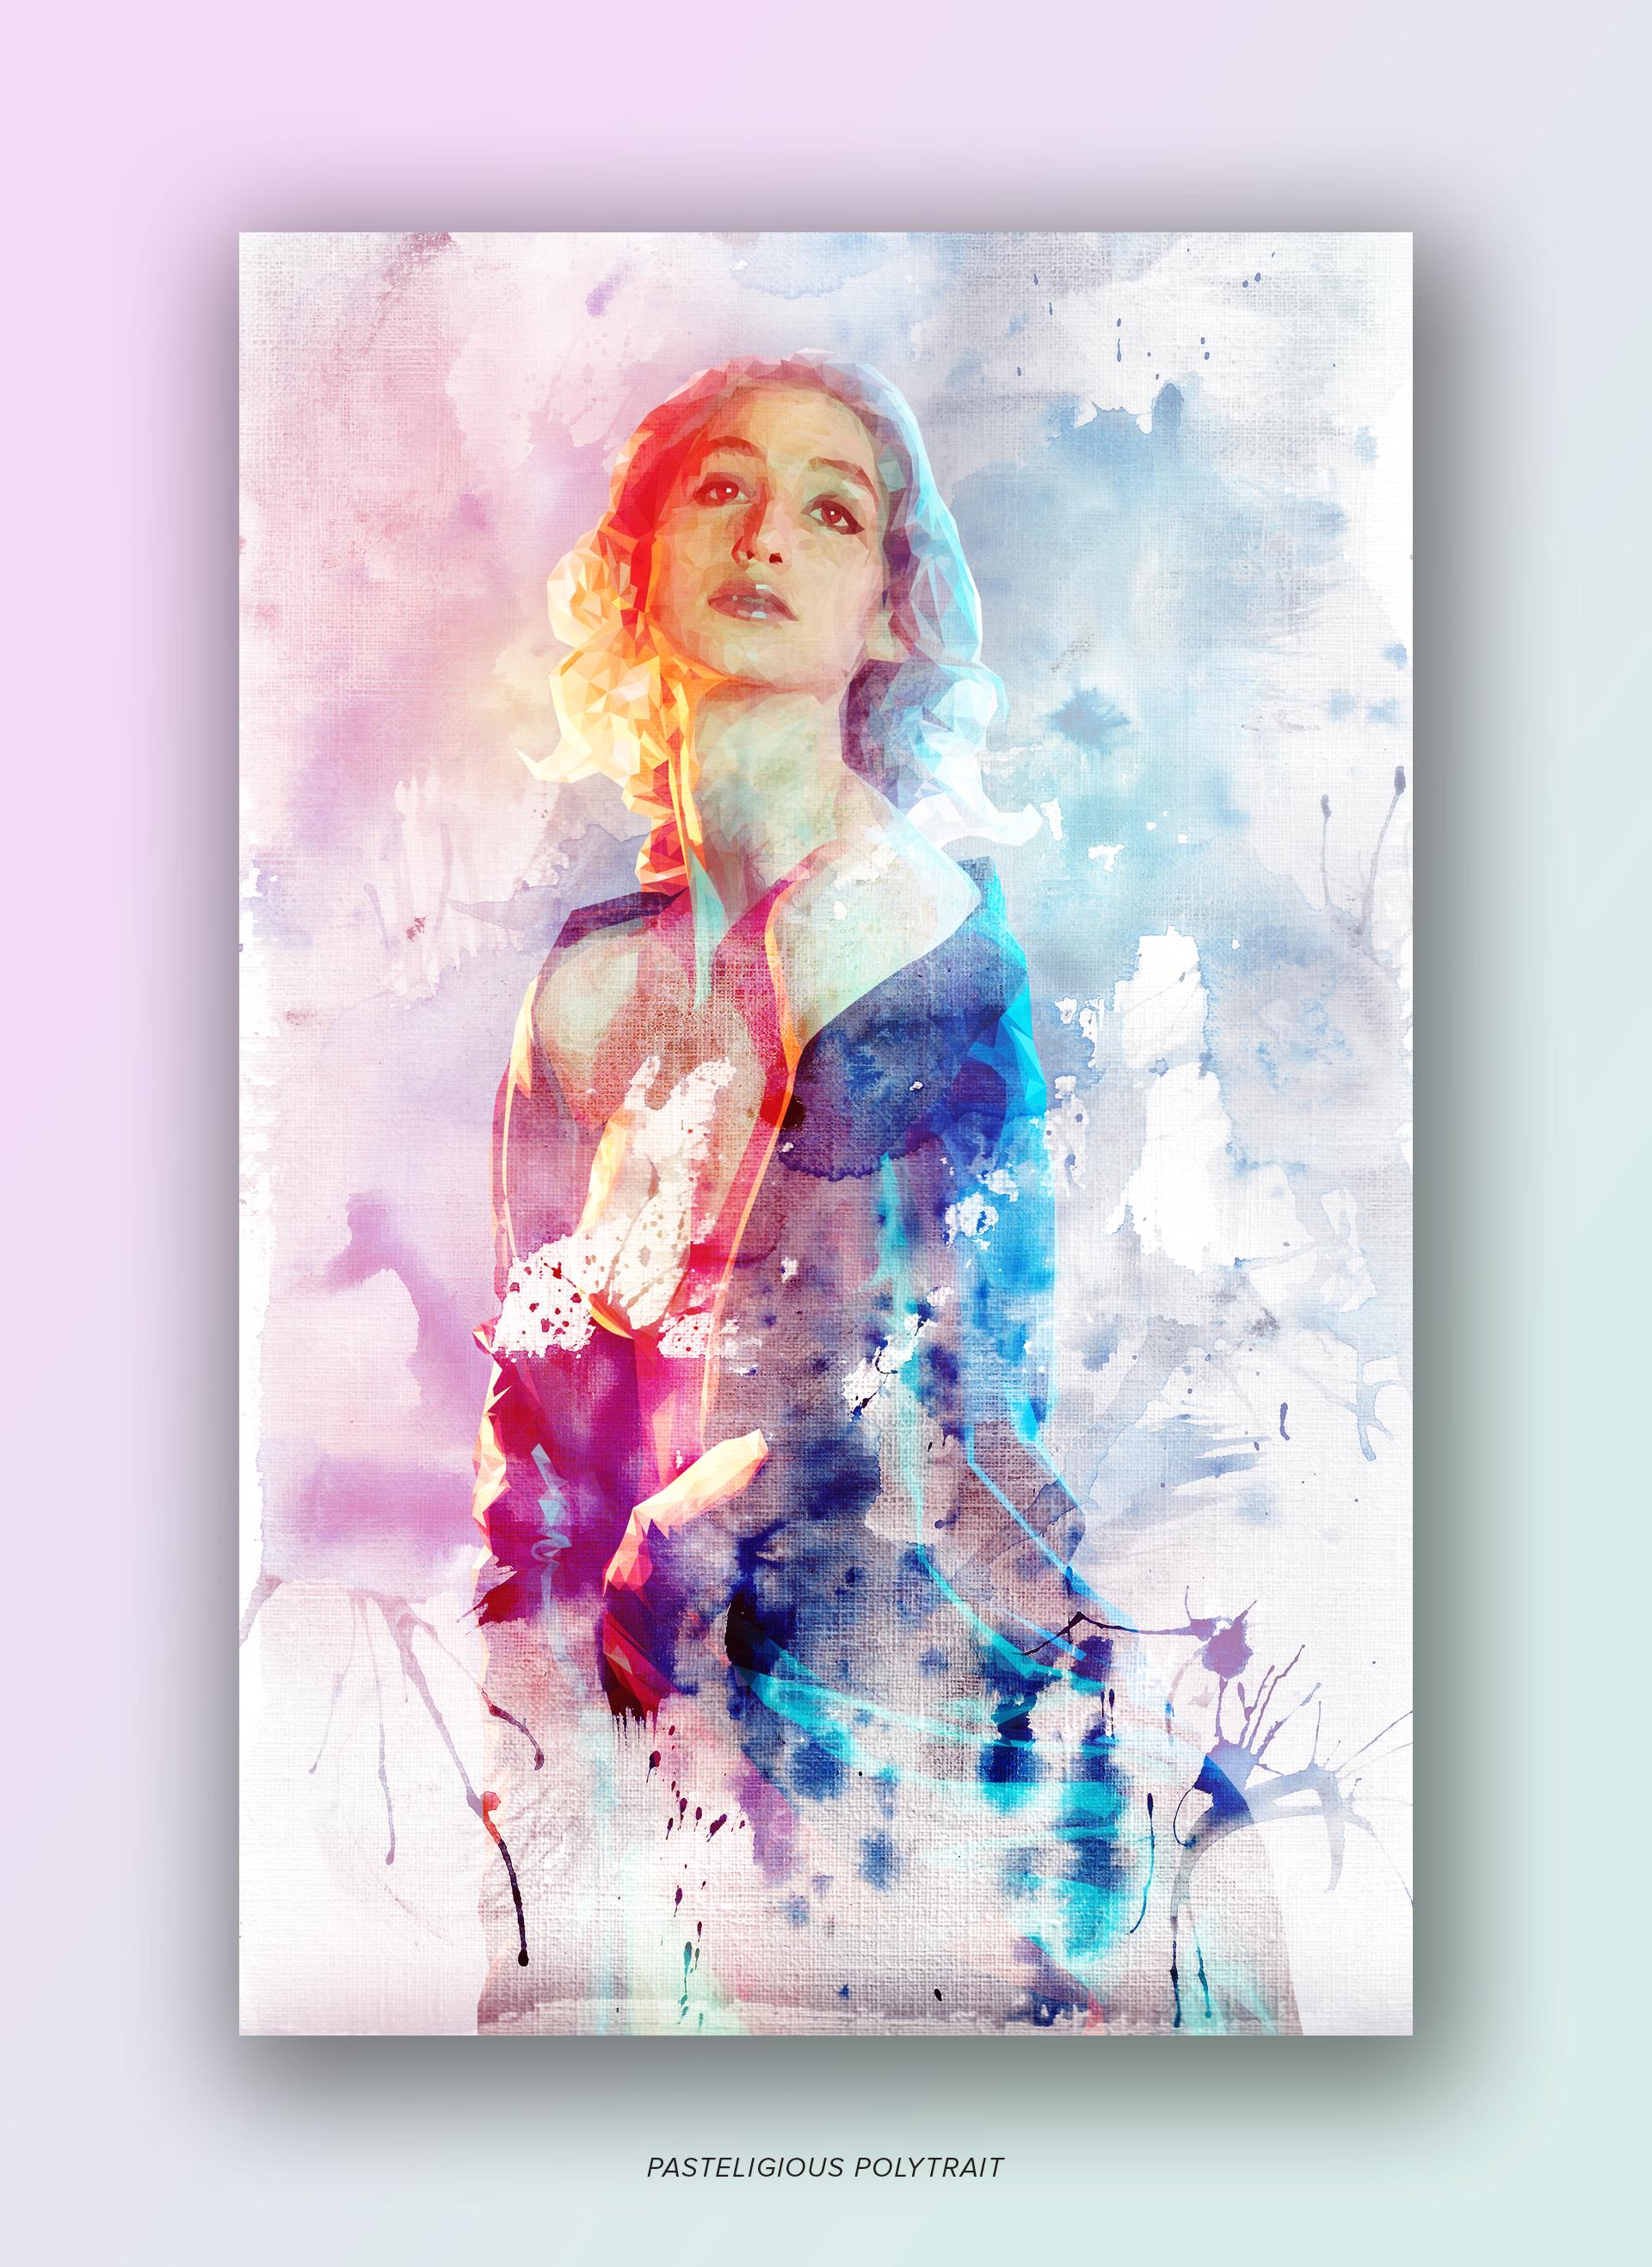 "Series of art prints ""Pasteligious Polytrait"" by Geena Matuson @geenamatuson #thegirlmirage. See more @ https://thegirlmirage.com."